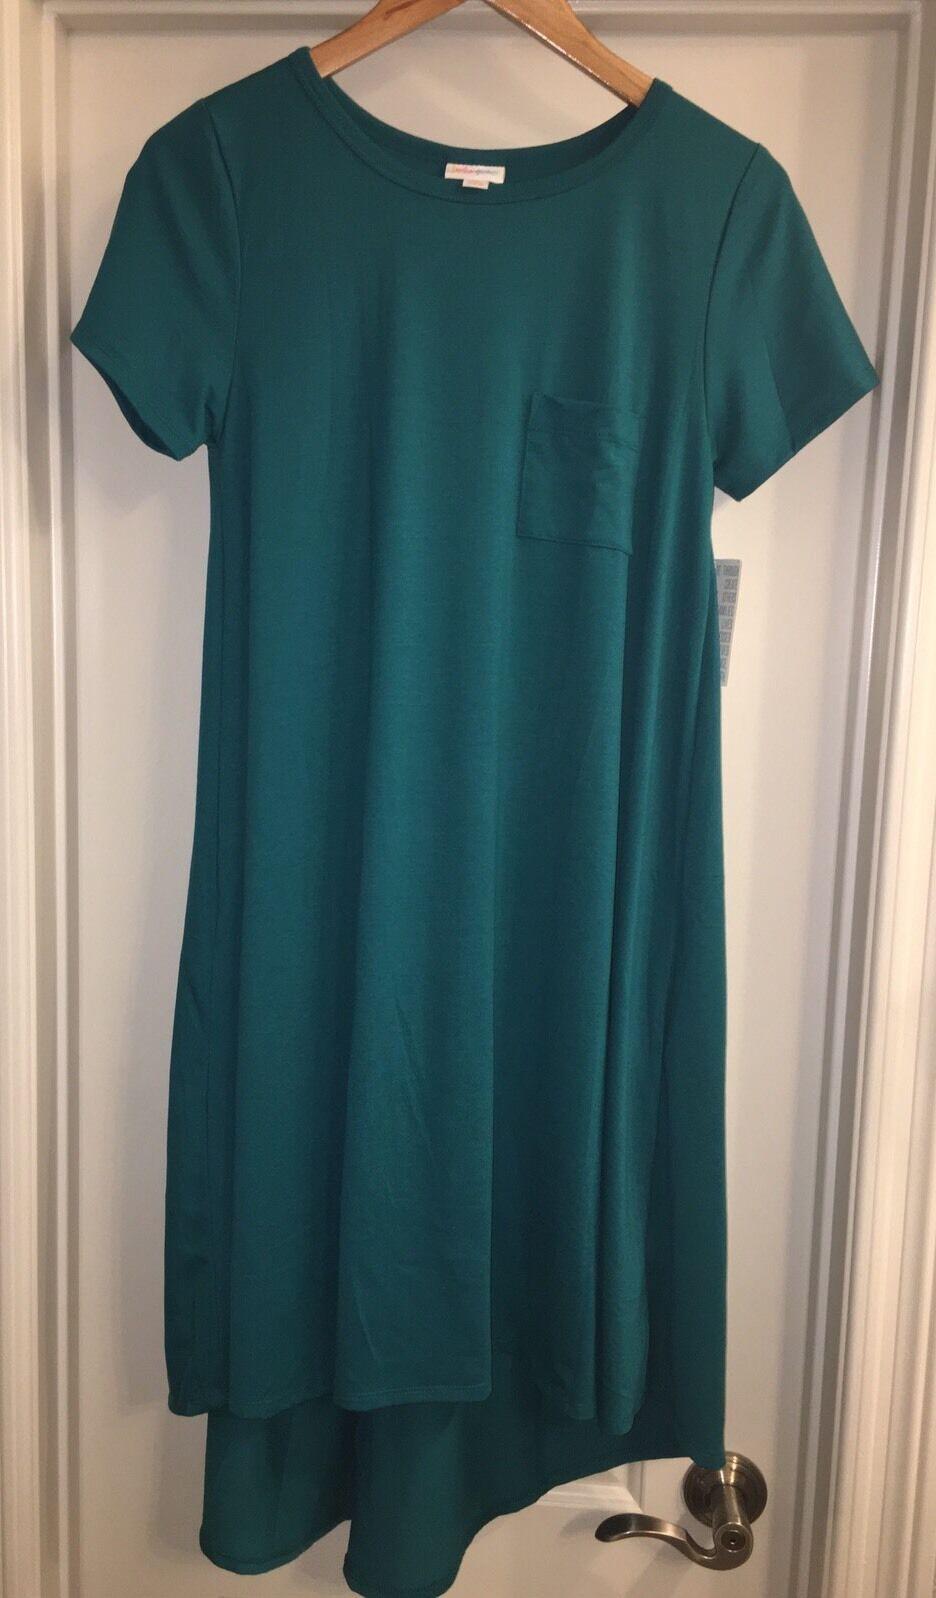 NWT LuLaRoe Carly Dress Size XS Extra Small Gorgeous Solid Teal HTF Unicorn